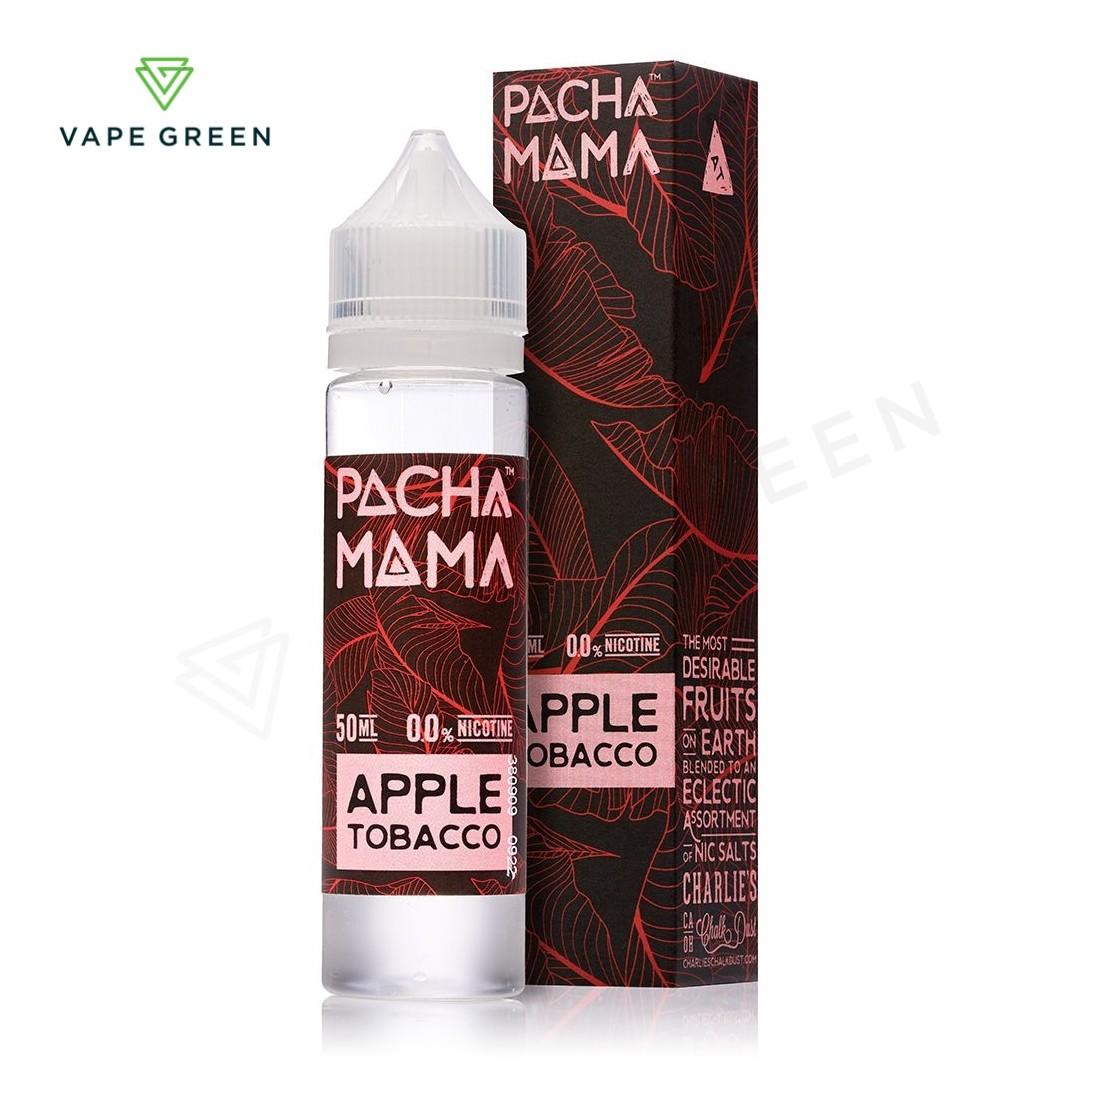 Apple Tobacco E-Liquid by Pacha Mama 50ml